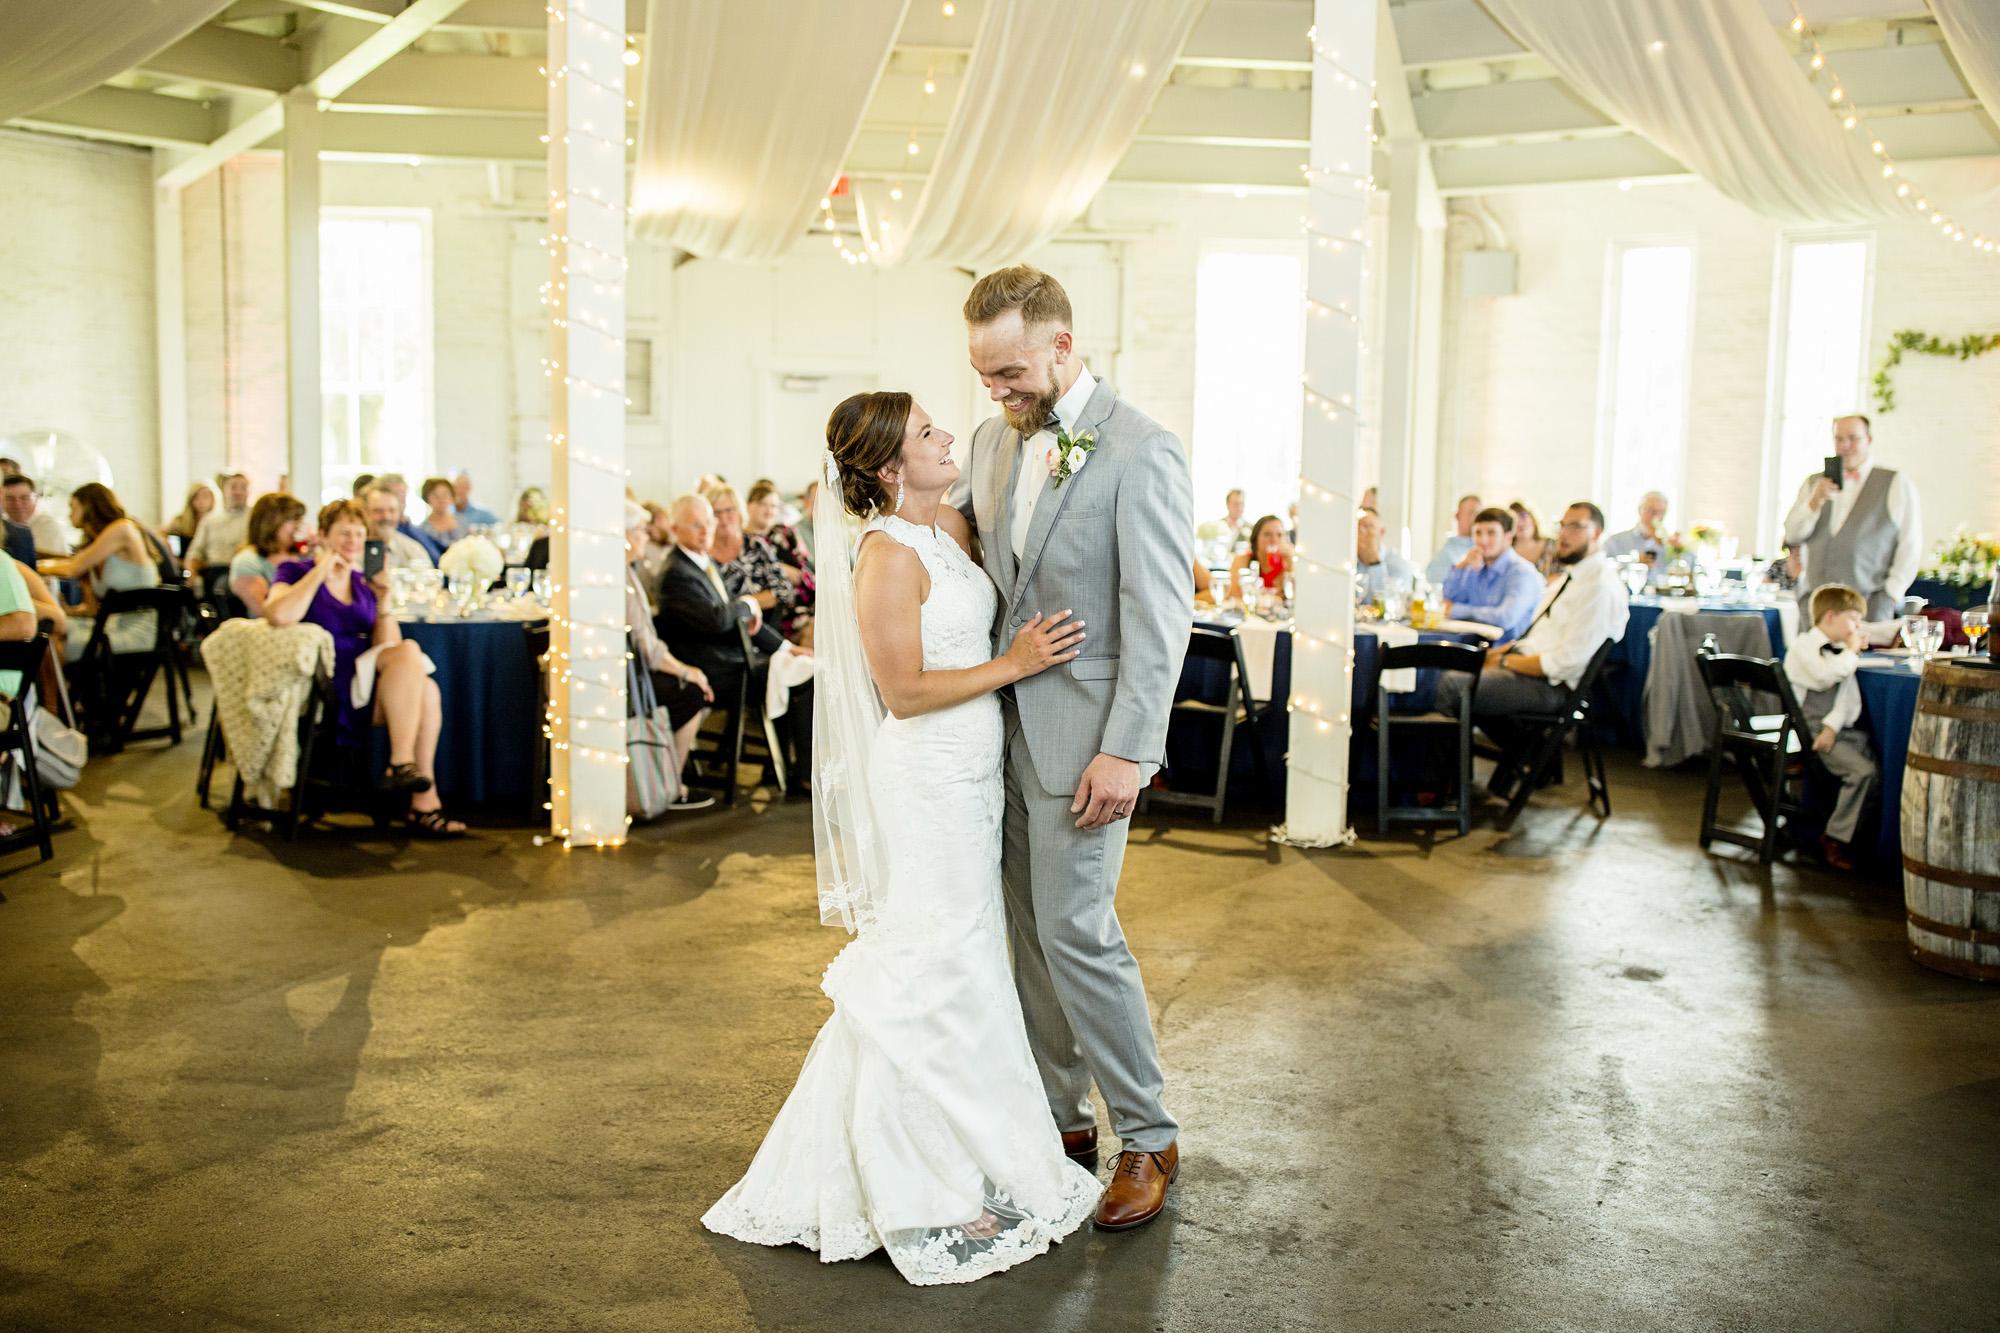 Seriously_Sabrina_Photography_Lexington_Kentucky_Round_Barn_Red_Mile_Stable_of_Memories_Wedding_Hart_95.jpg